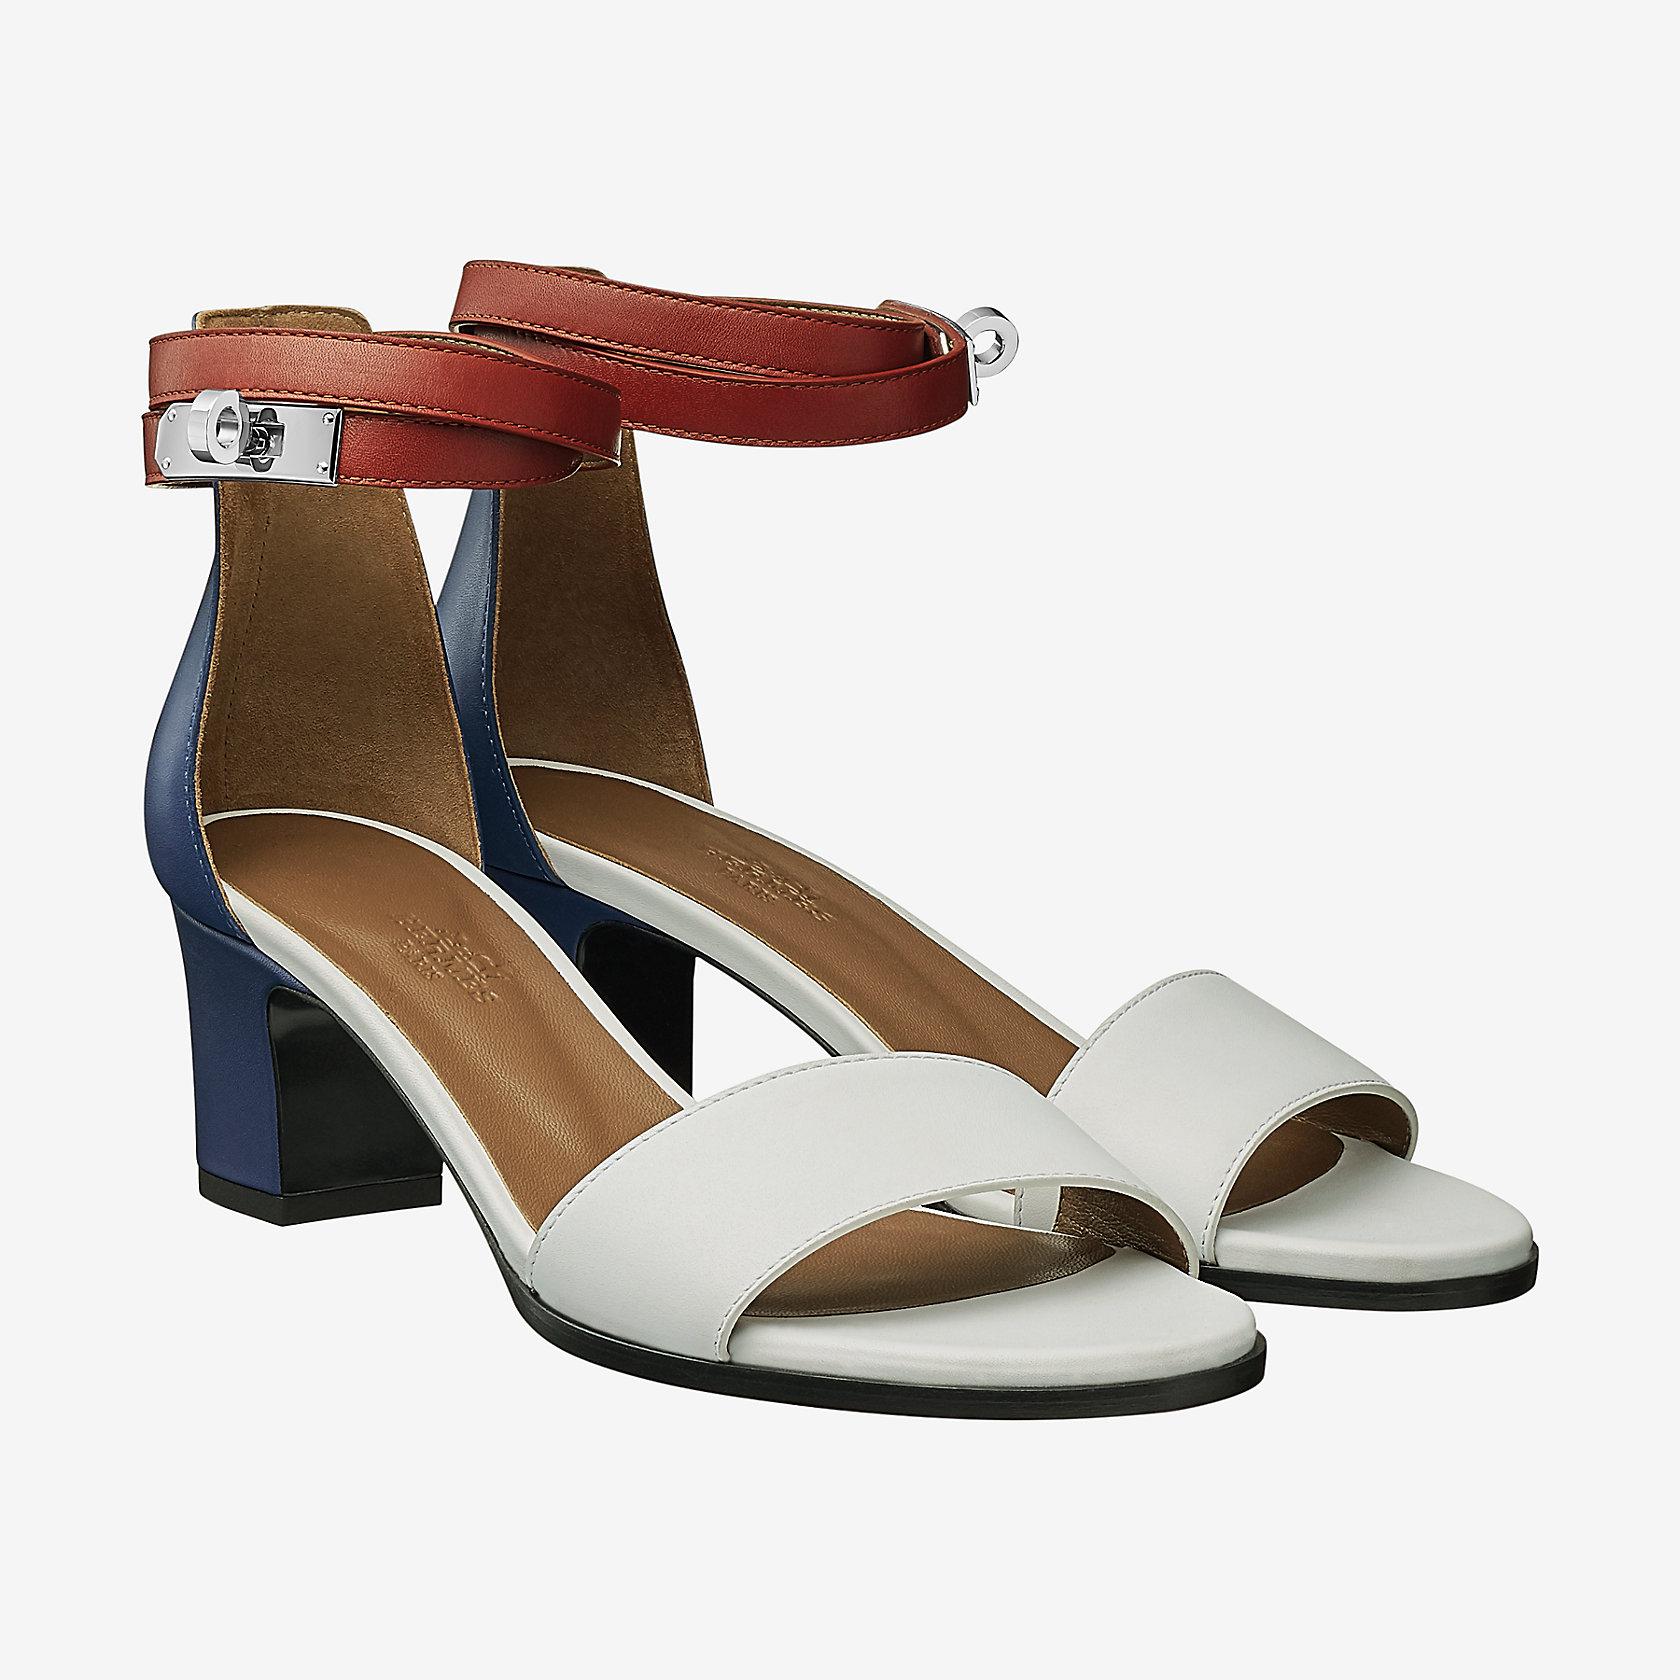 69064e974fcc Manege sandal